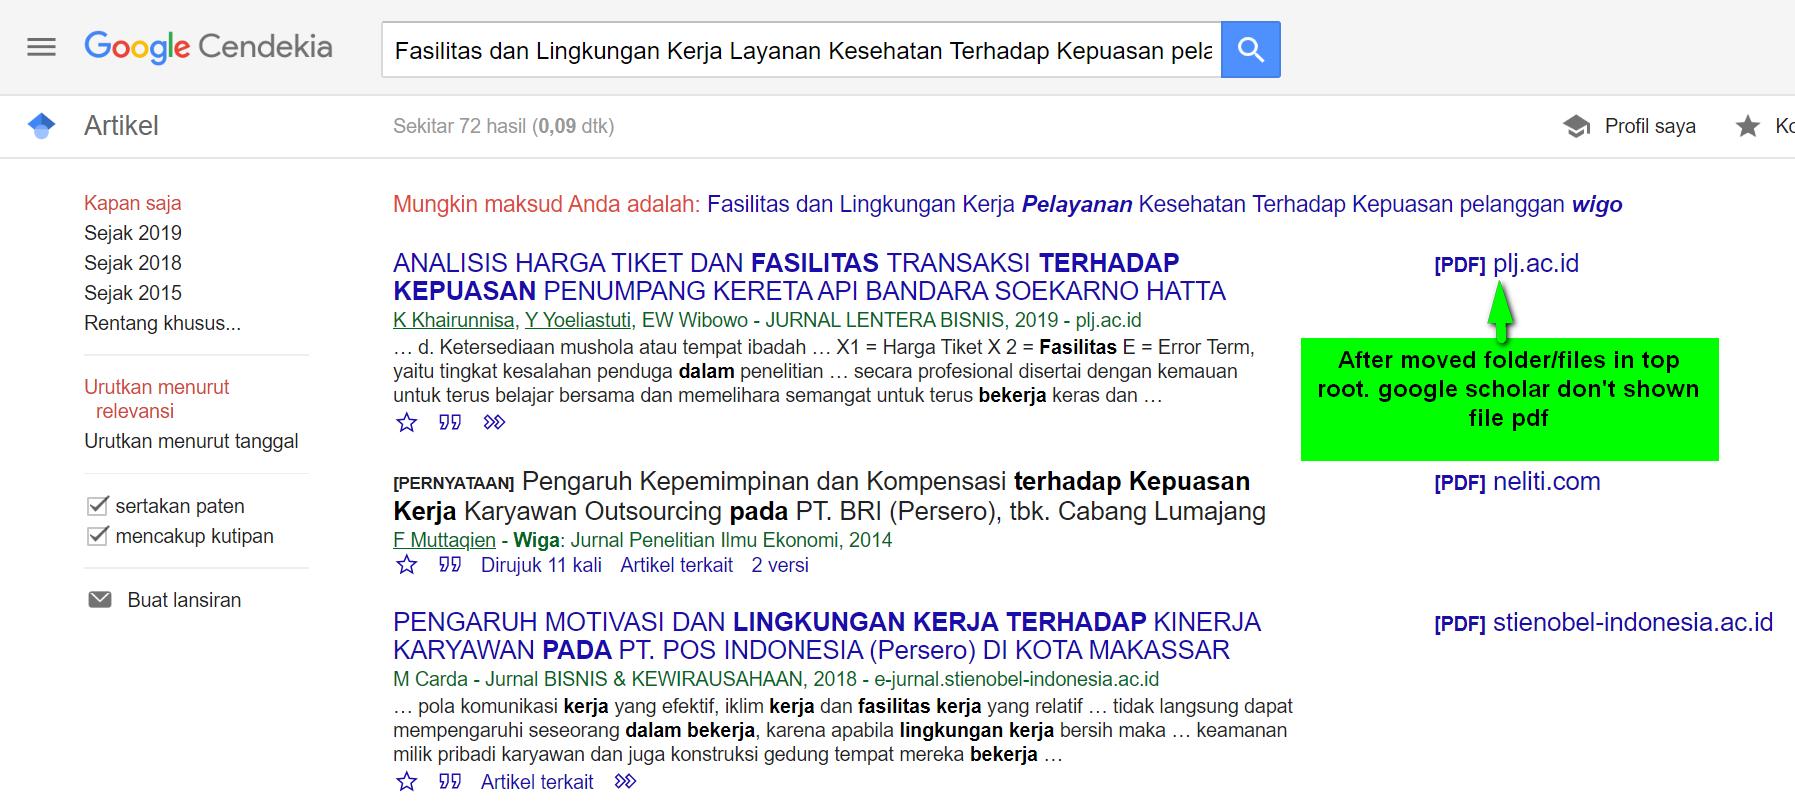 Trouble Google Scholar Indexed After Upgrade V 3 1 0 0 To V 3 1 2 2 Software Support Pkp Community Forum